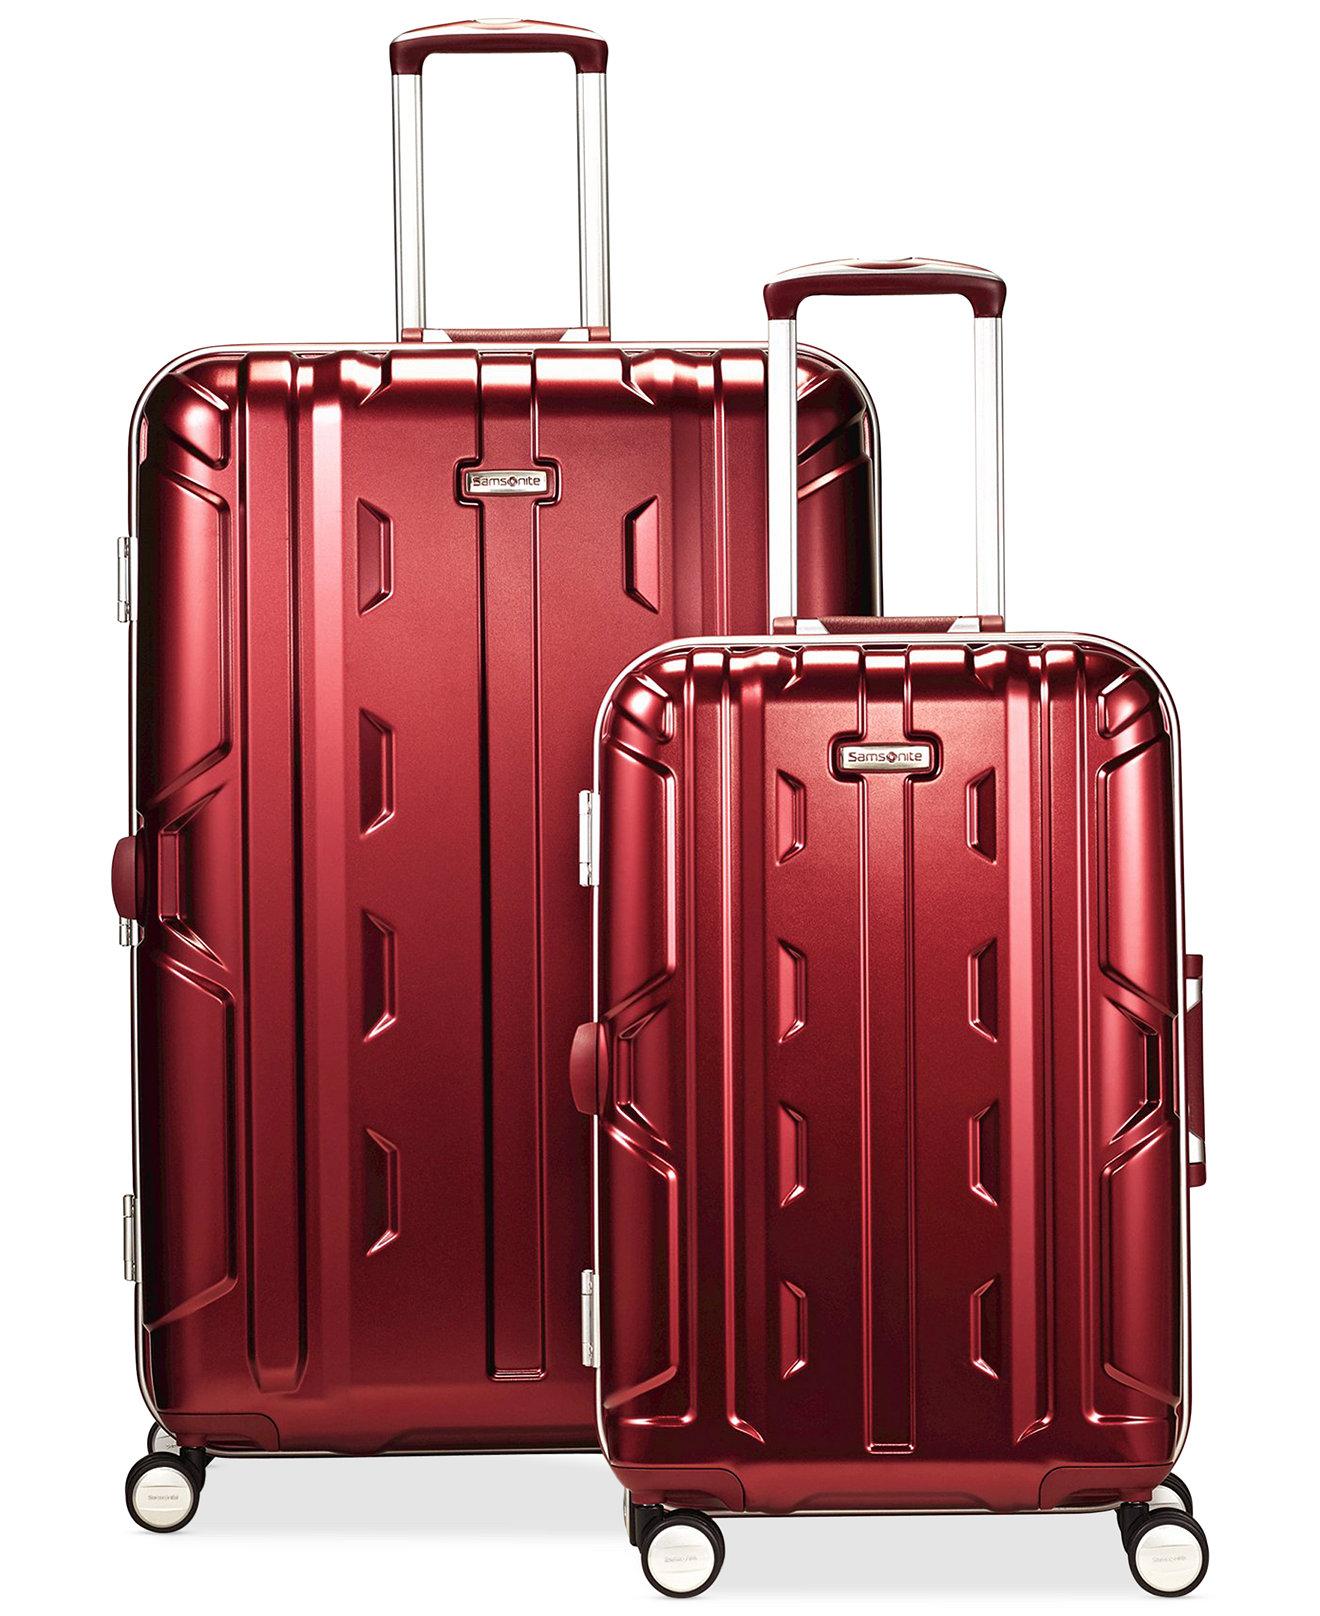 Samsonite Luggage - Macy's